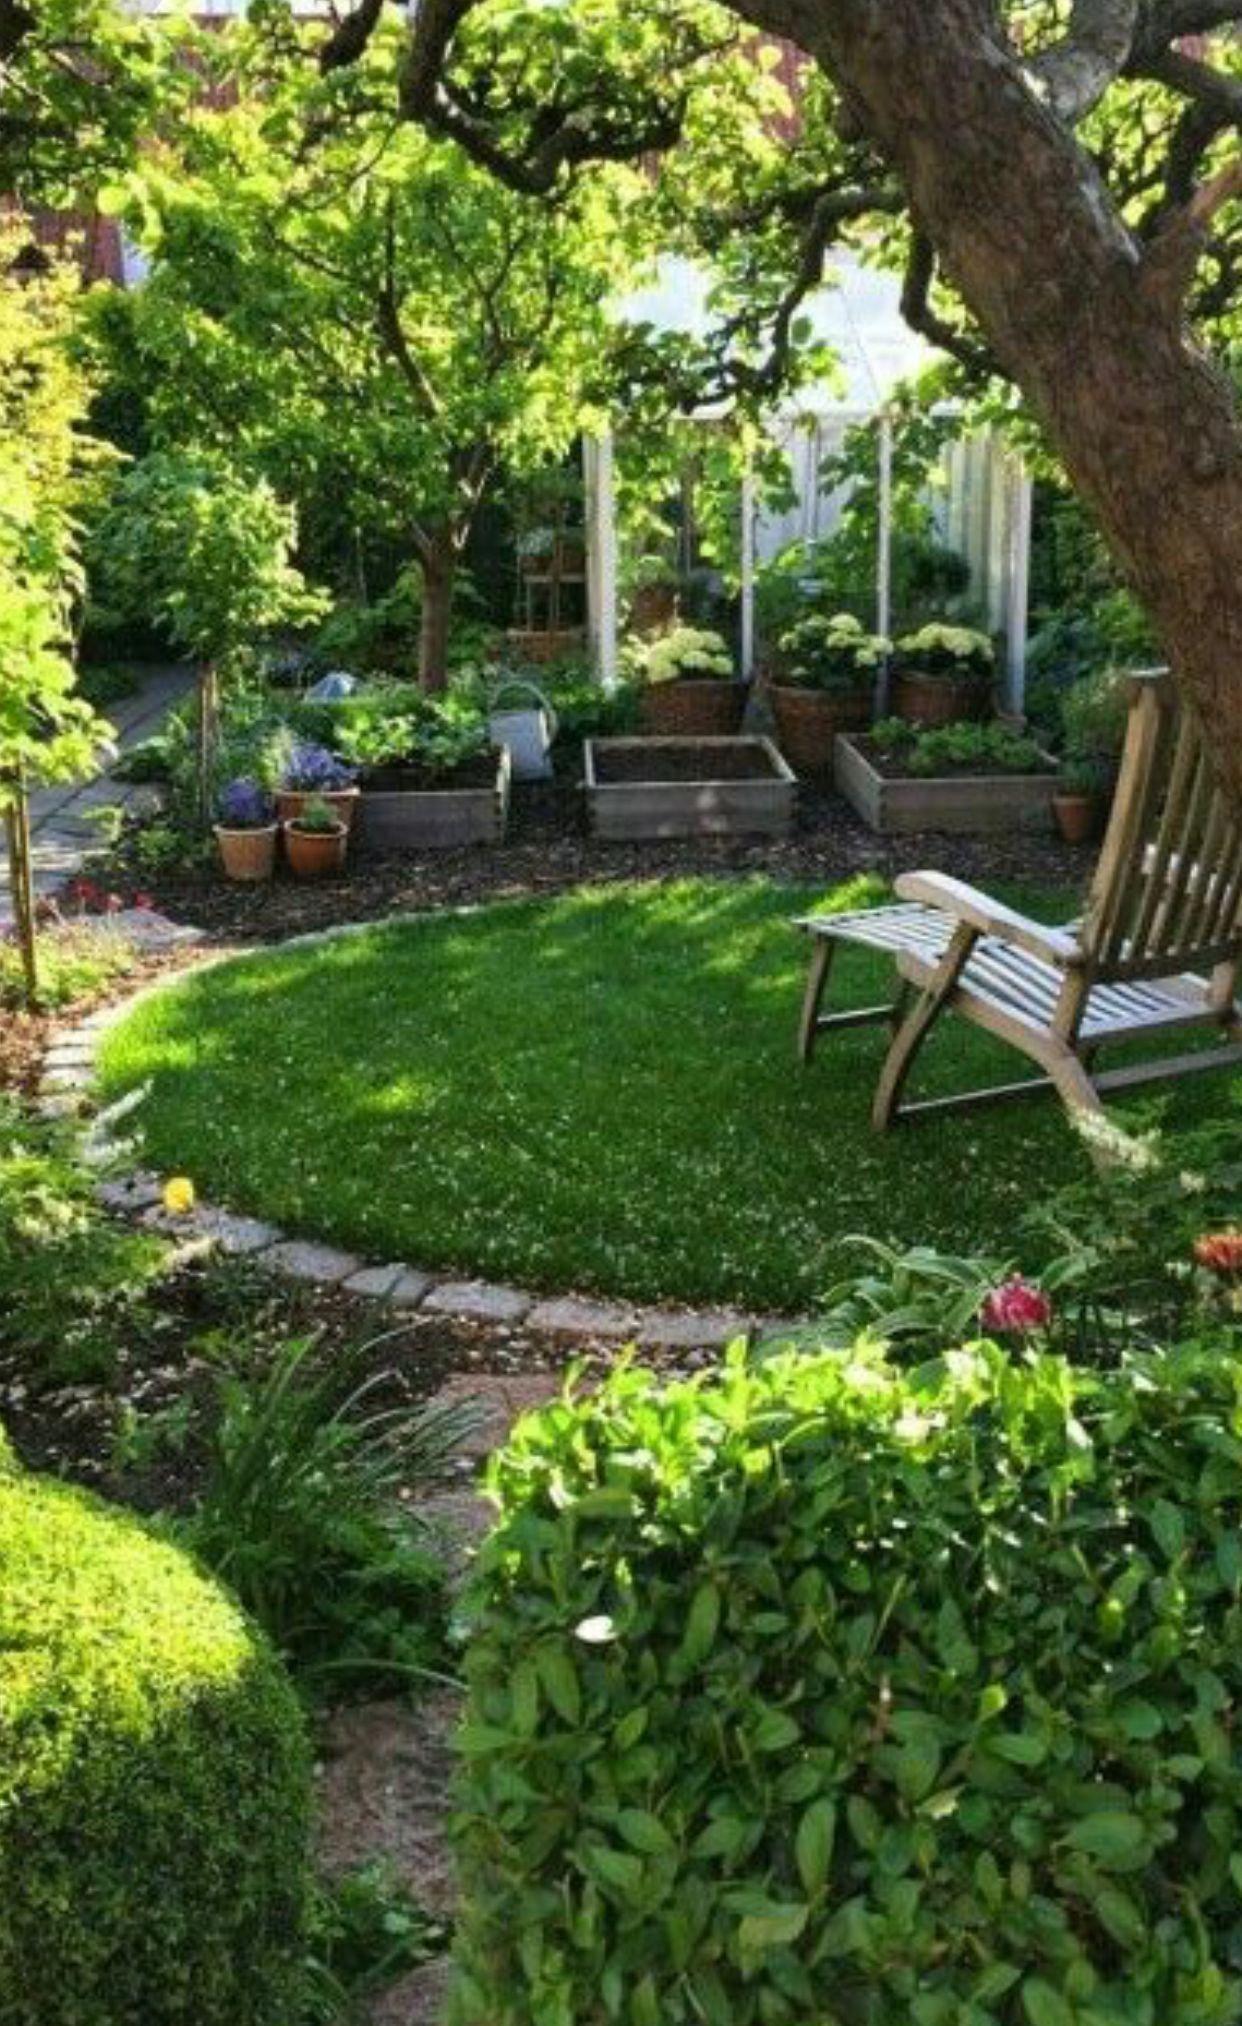 Pin On Garden Ideas Small Backyard Landscaping Cottage Garden Design Small Garden Design Cottage backyard landscaping ideas